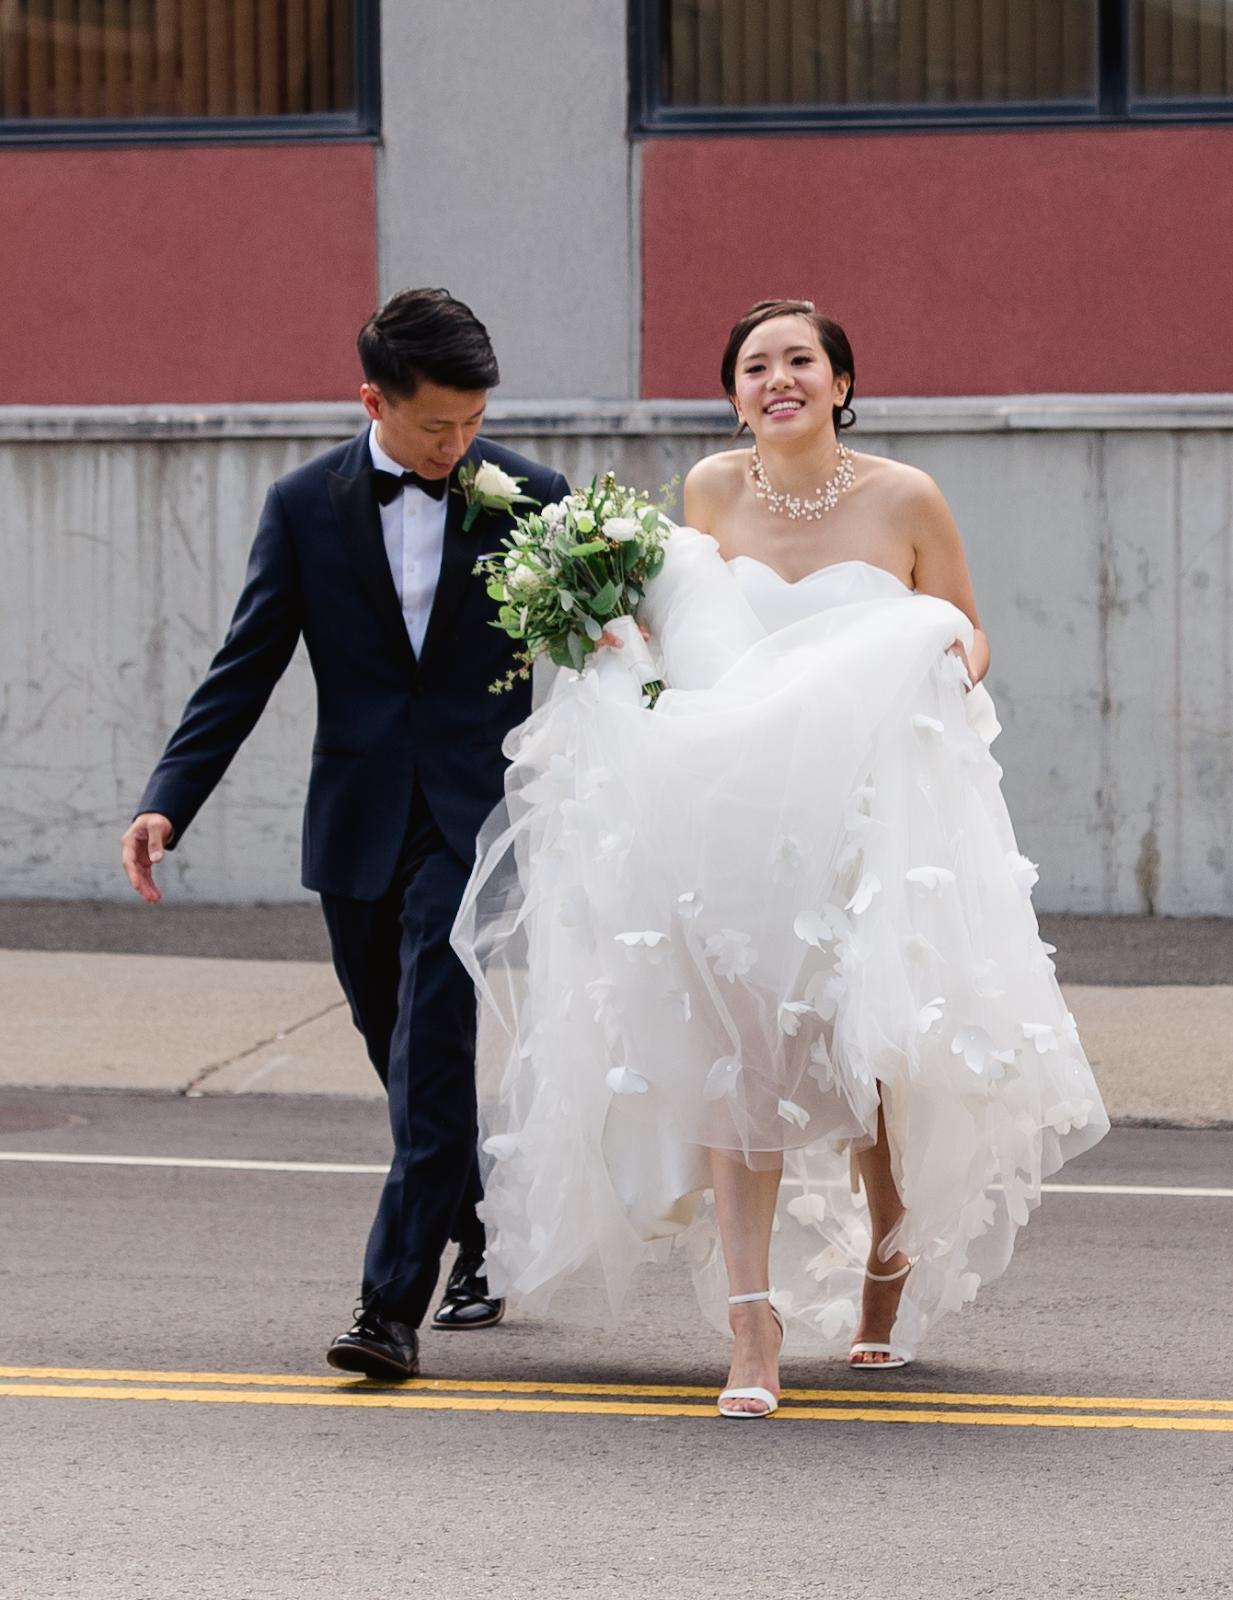 wedding dress photos real women real wedding shoes poking out wedding photo